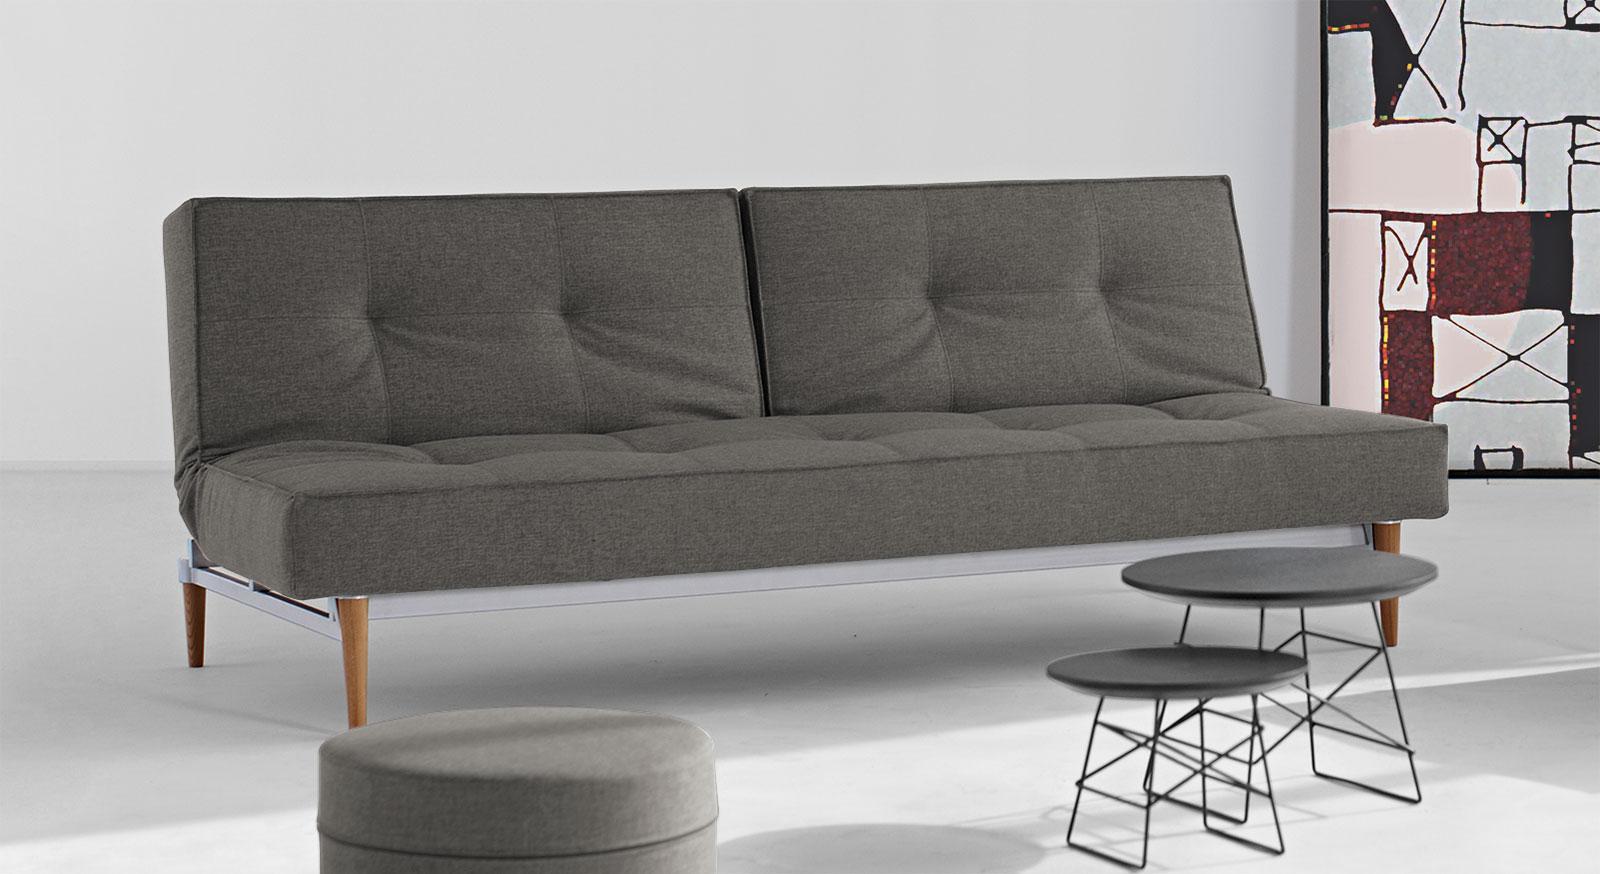 taschenfederkern schlafsofa in grau oder blau walton. Black Bedroom Furniture Sets. Home Design Ideas